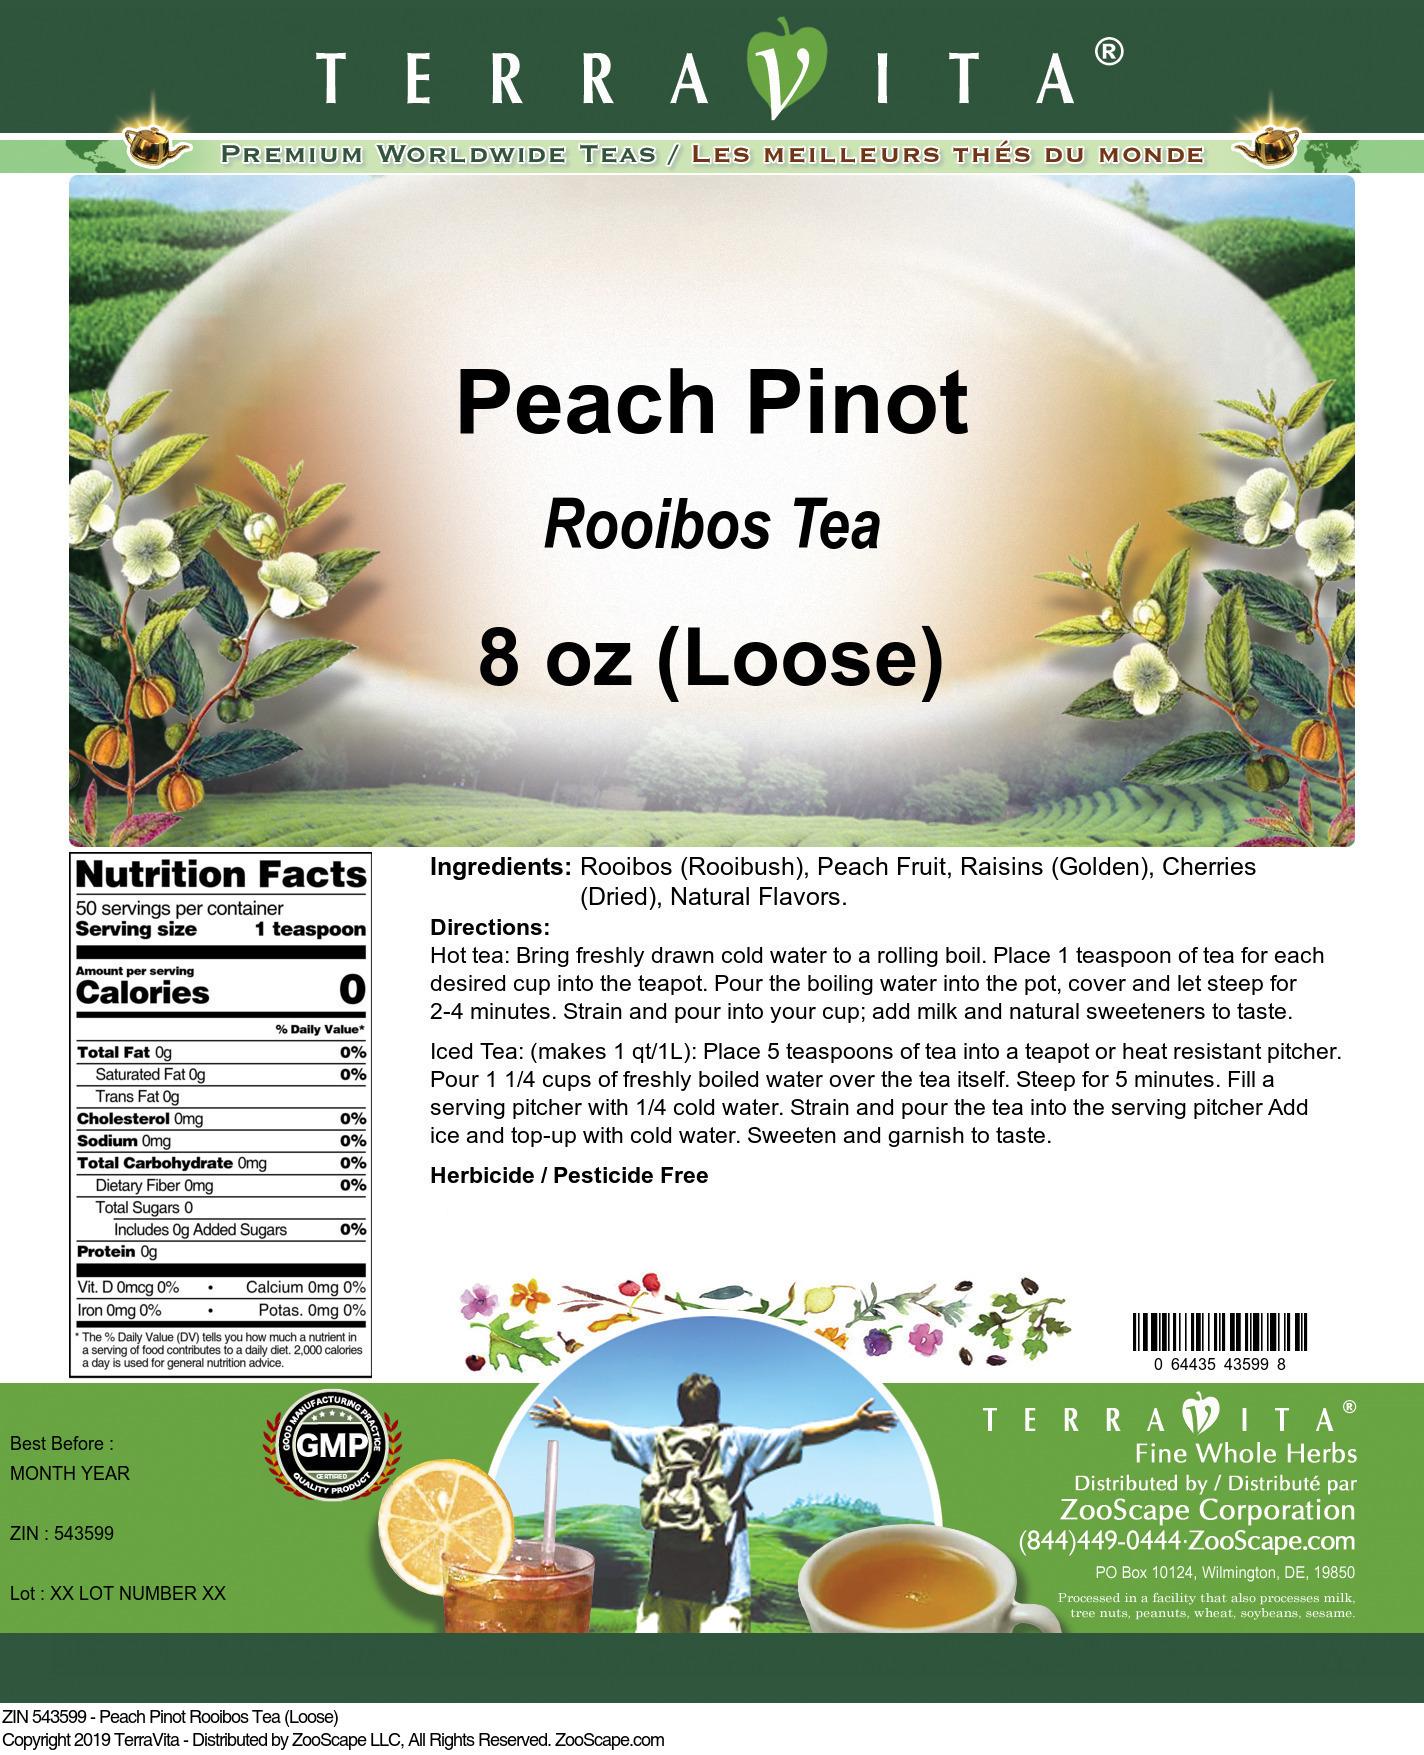 Peach Pinot Rooibos Tea